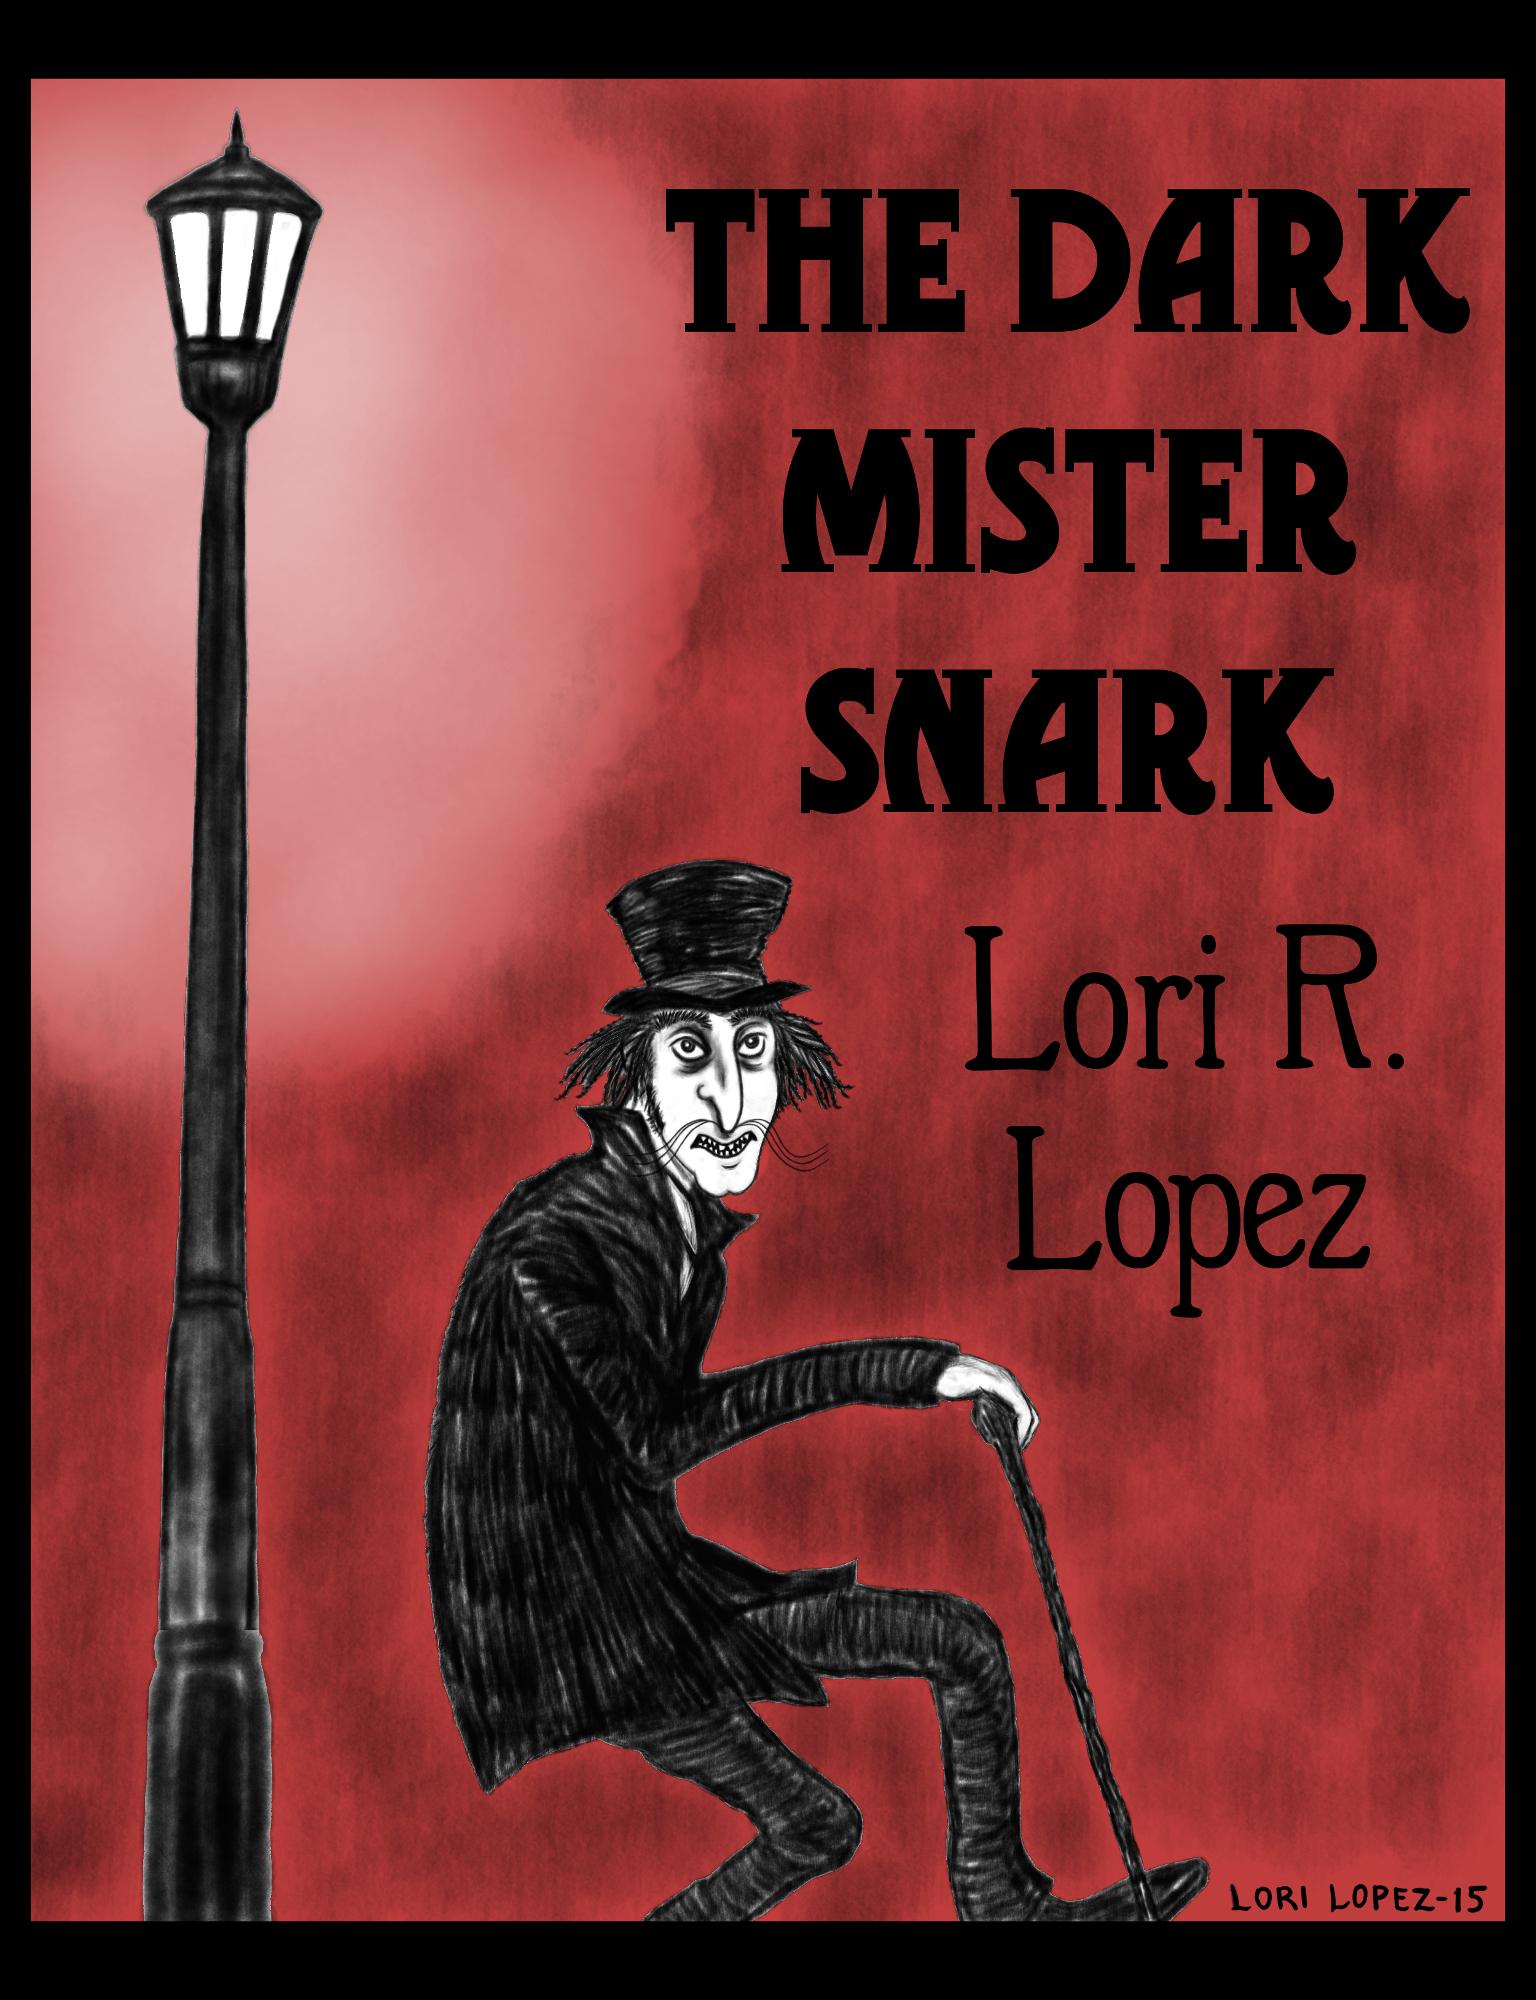 The Art of Lori R. Lopez 18